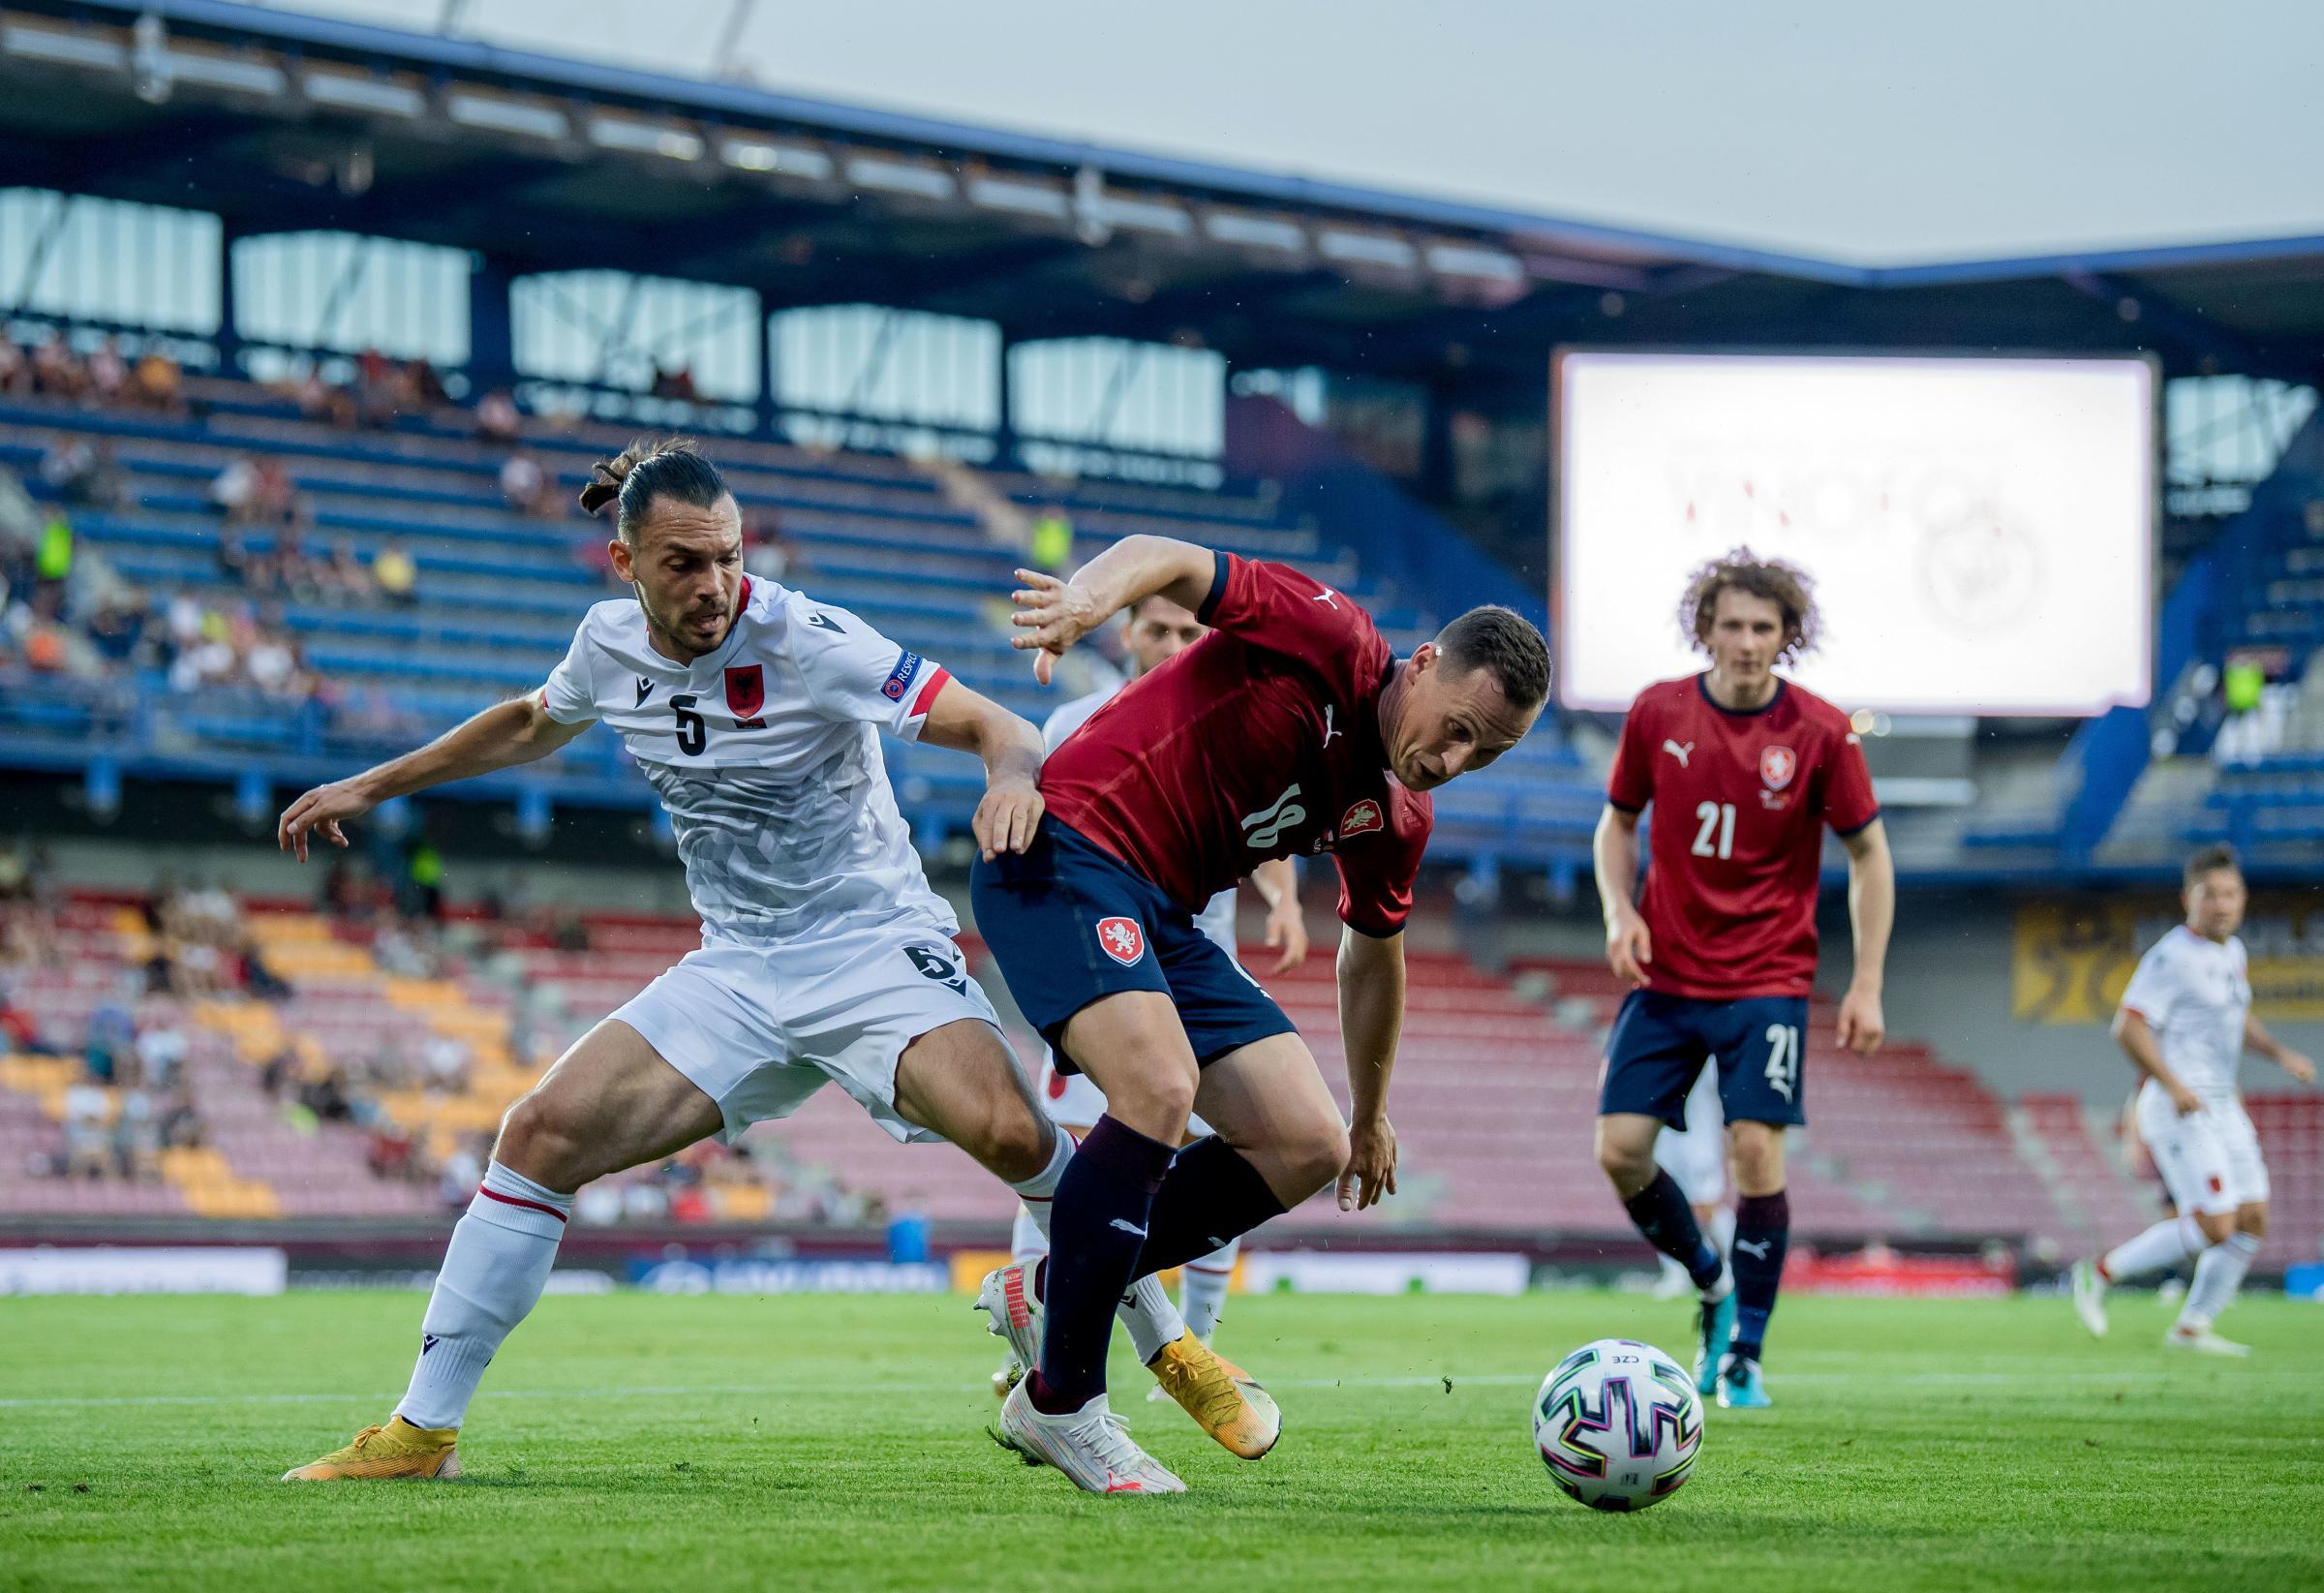 Euro 2020: How do Scotland's rivals Czech Republic shape up ahead of Group D